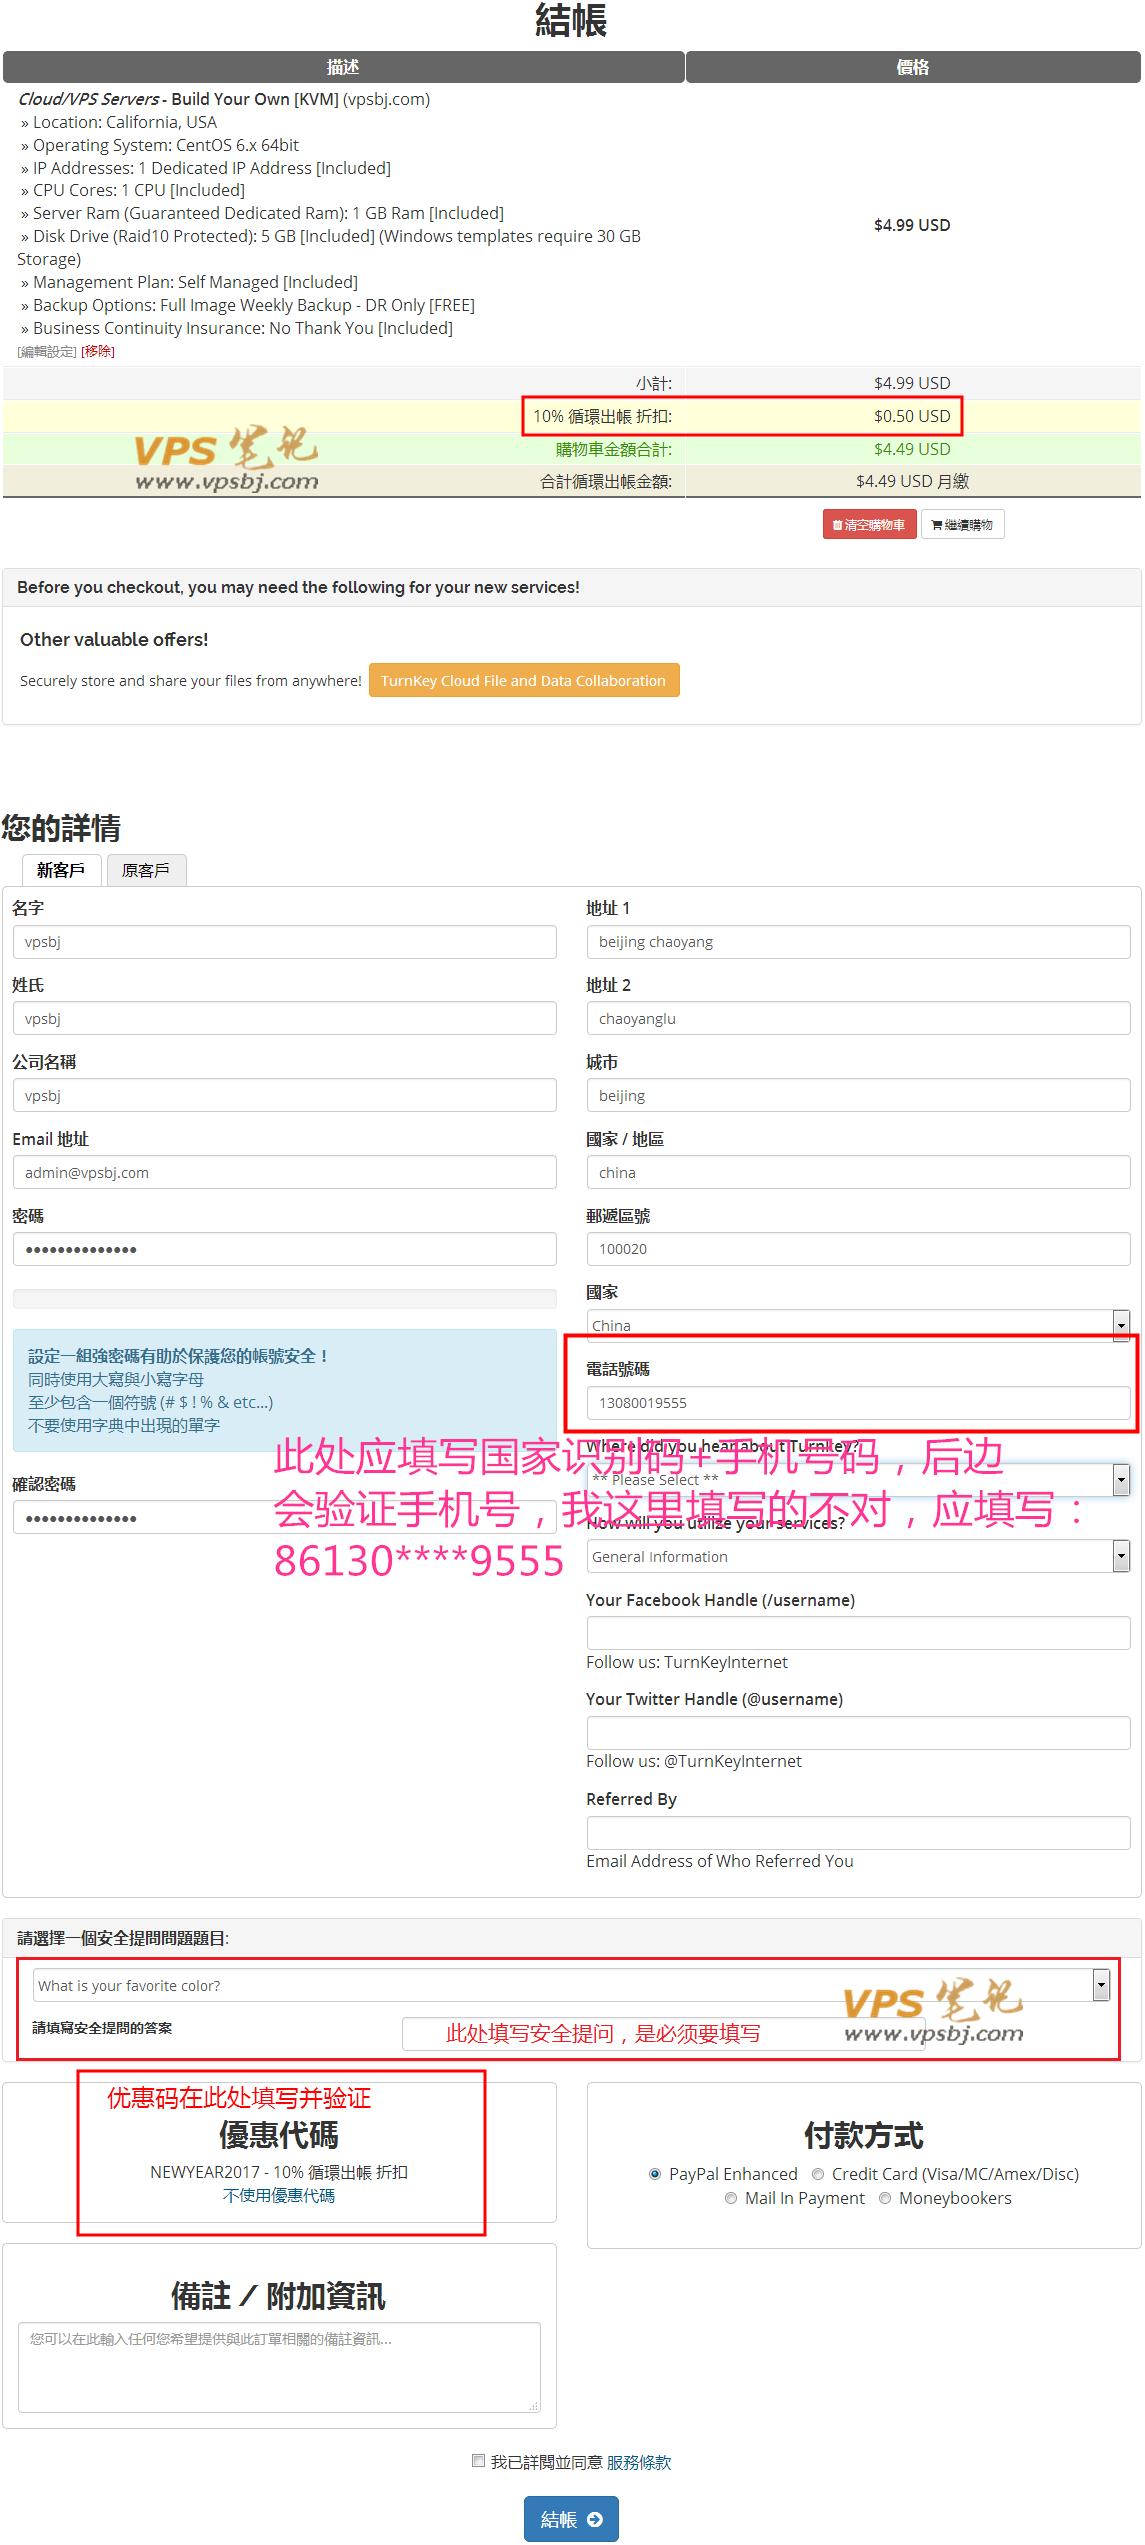 turnkeyinternet注册信息填写